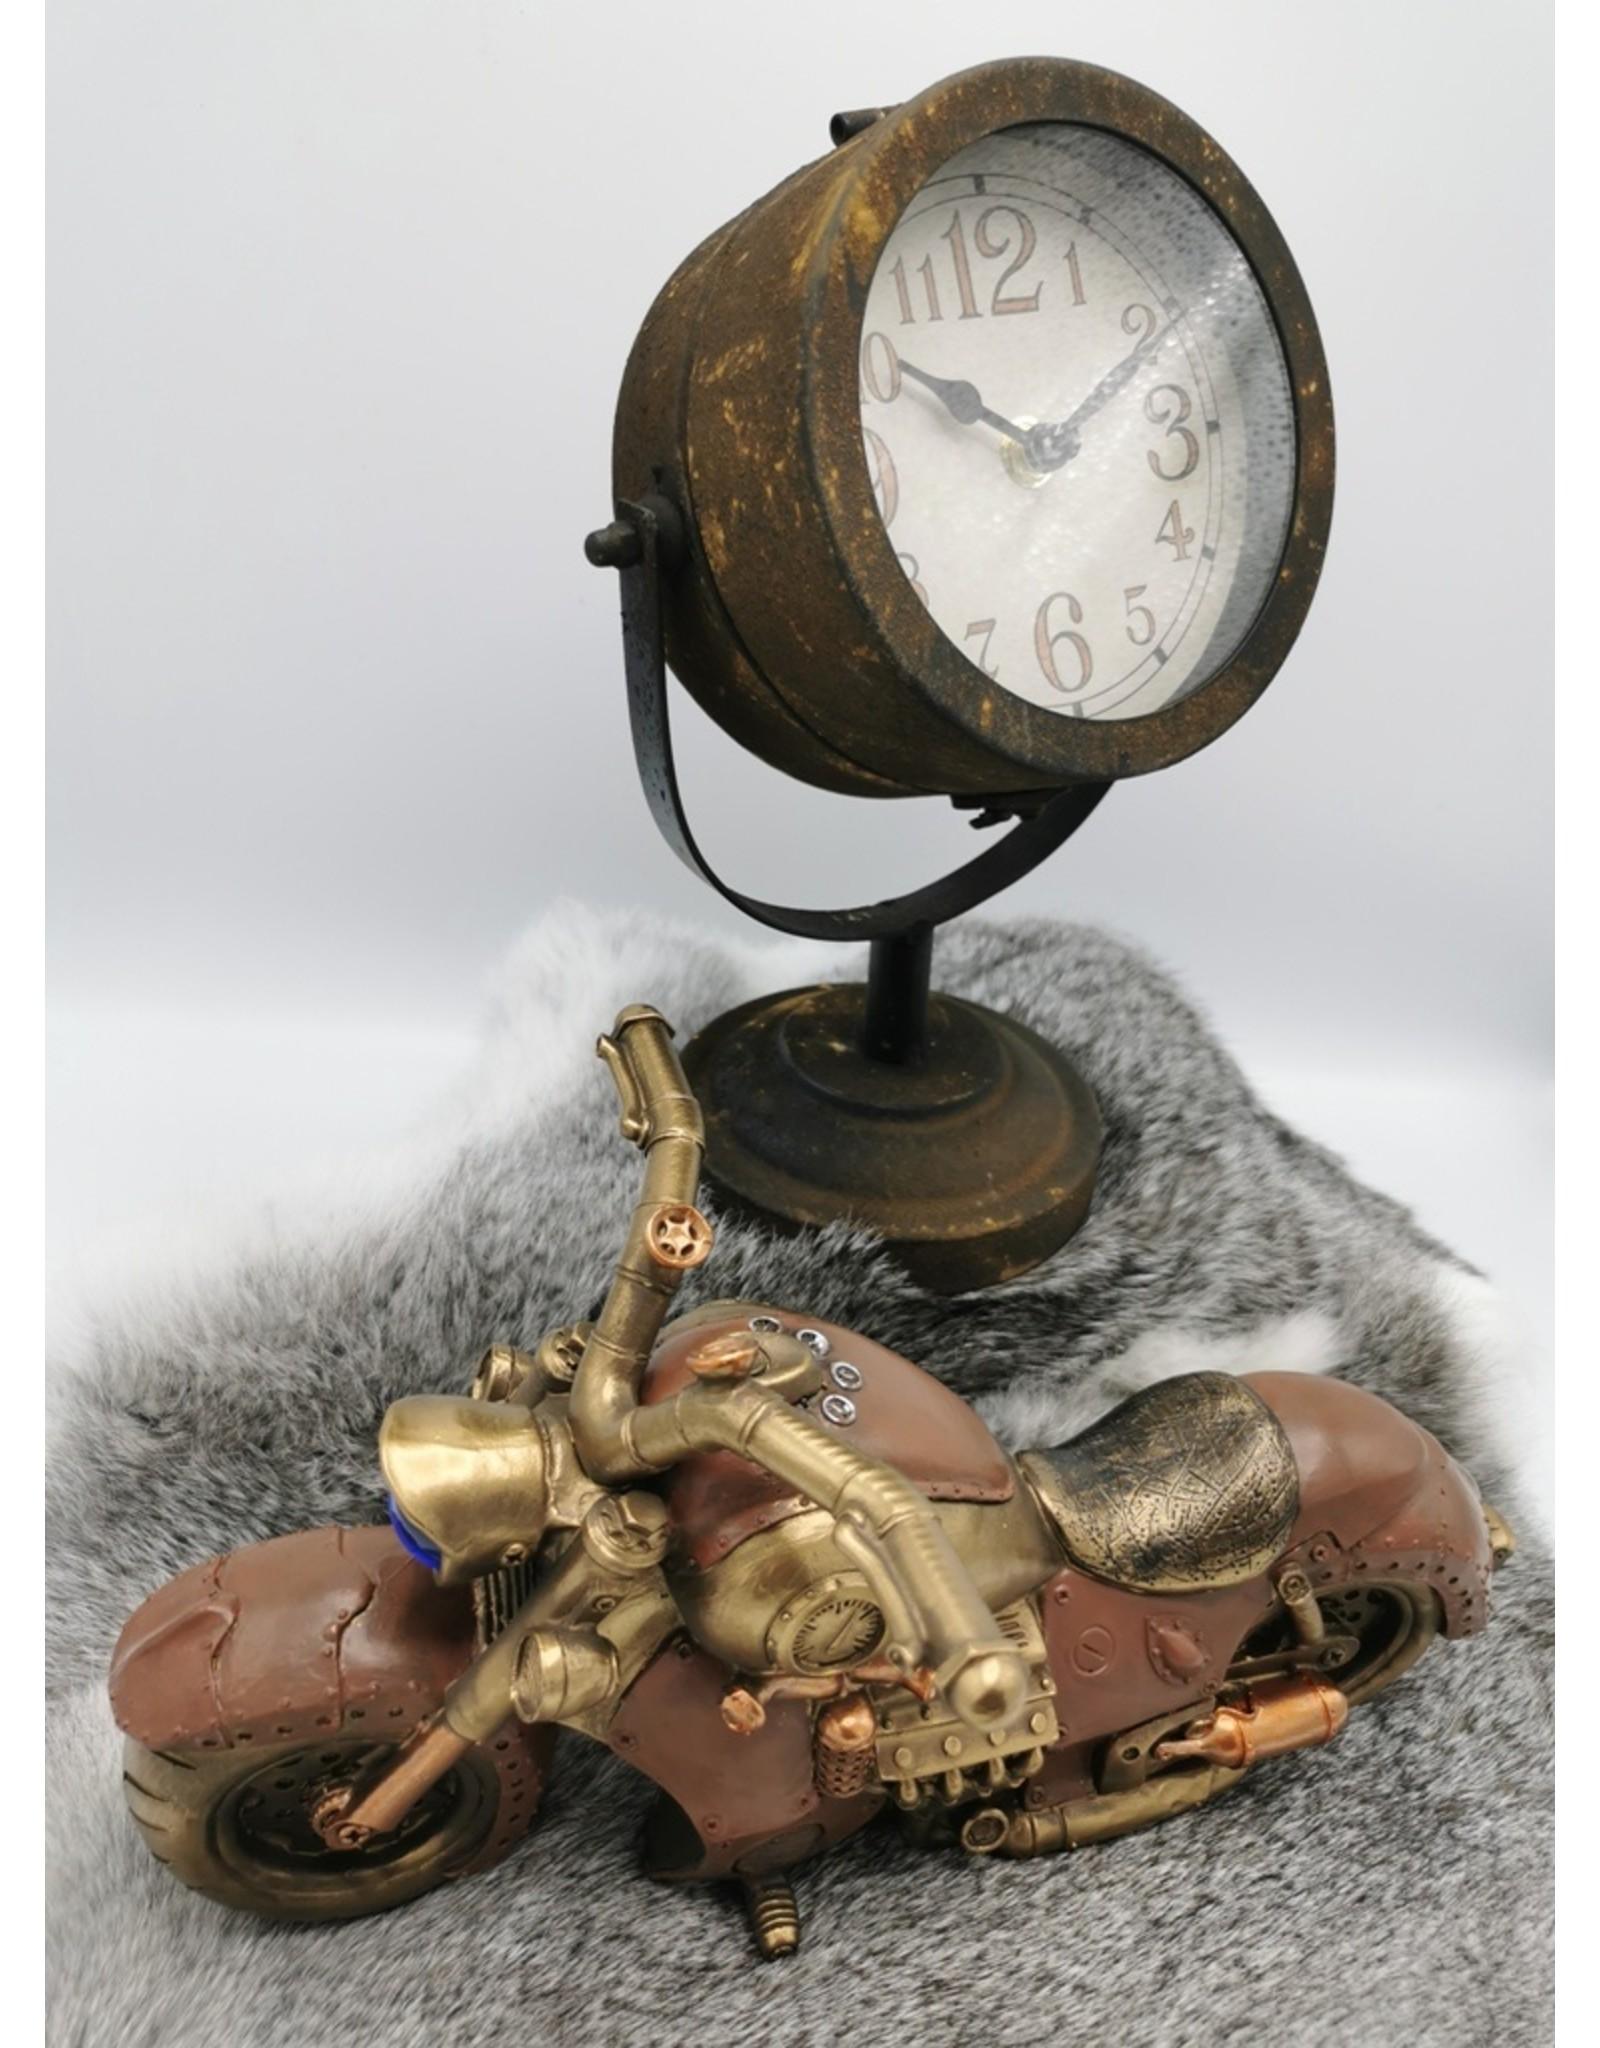 Trukado Miscellaneous - Clock Headlight Rust Brown Metal, Industrial look